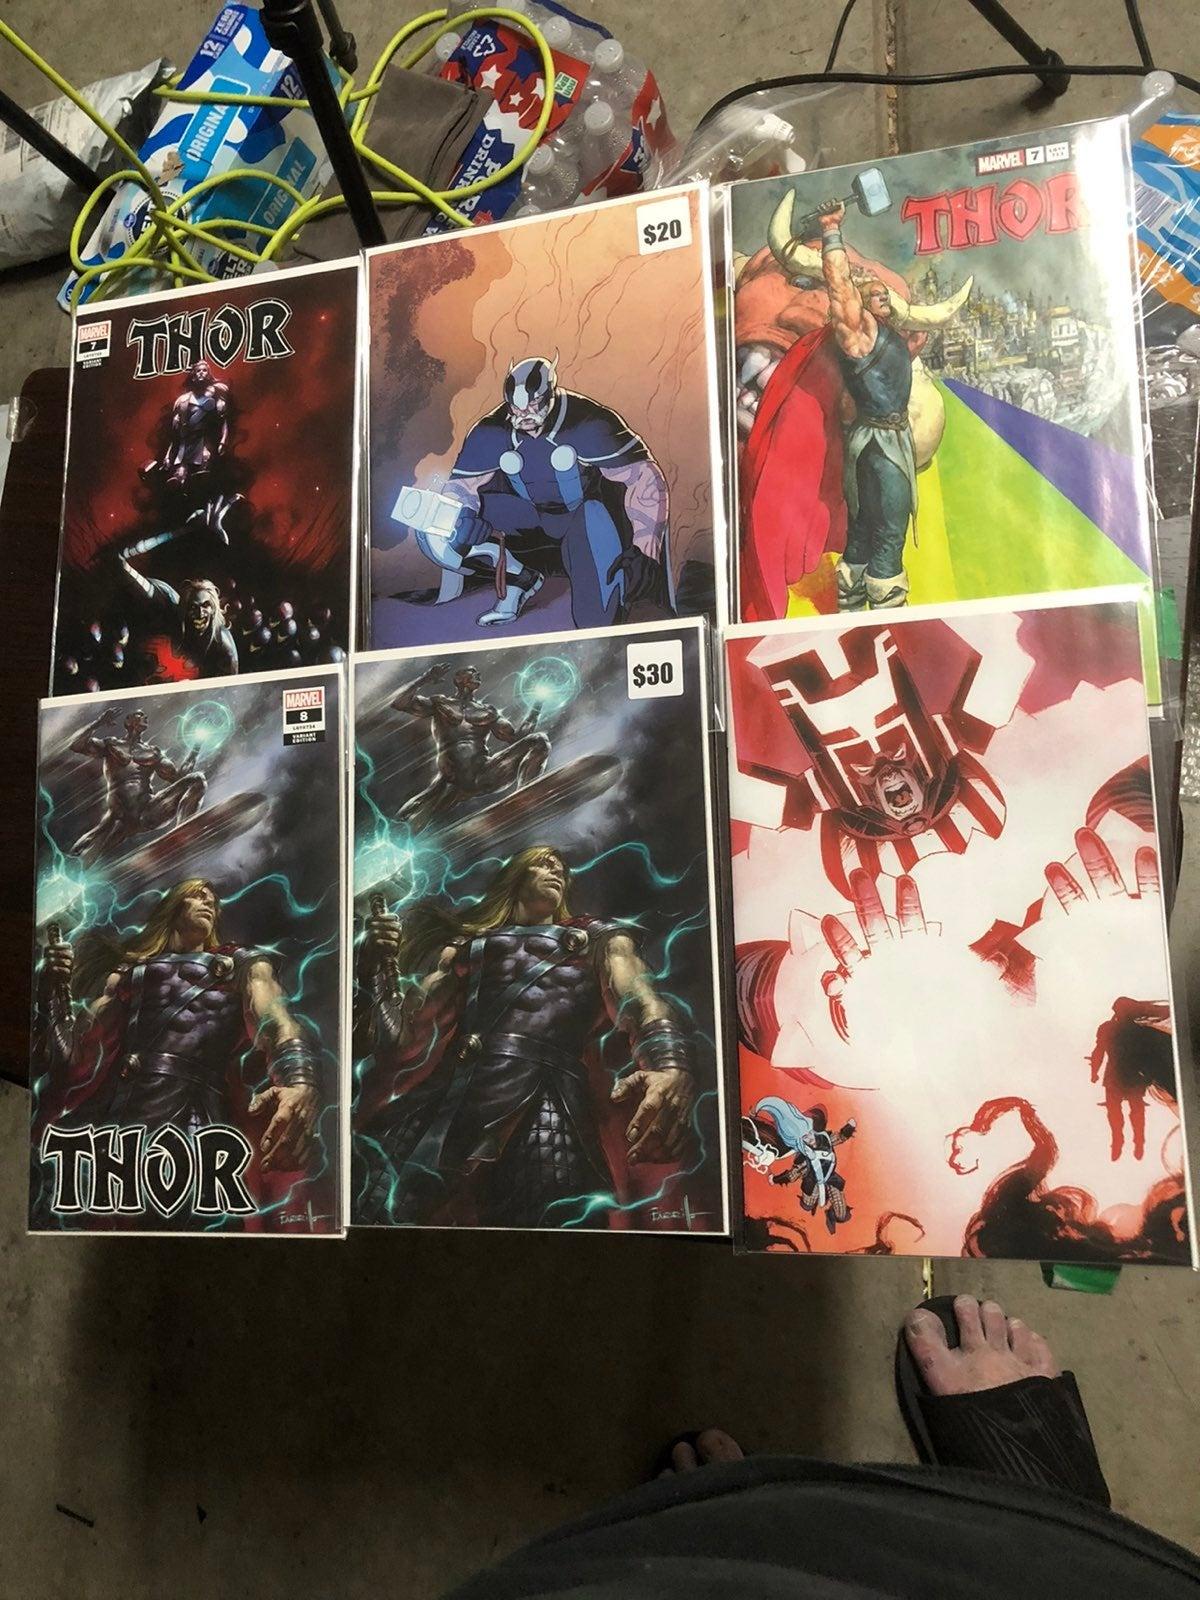 Lot of 6 Donny Cates Thor comics